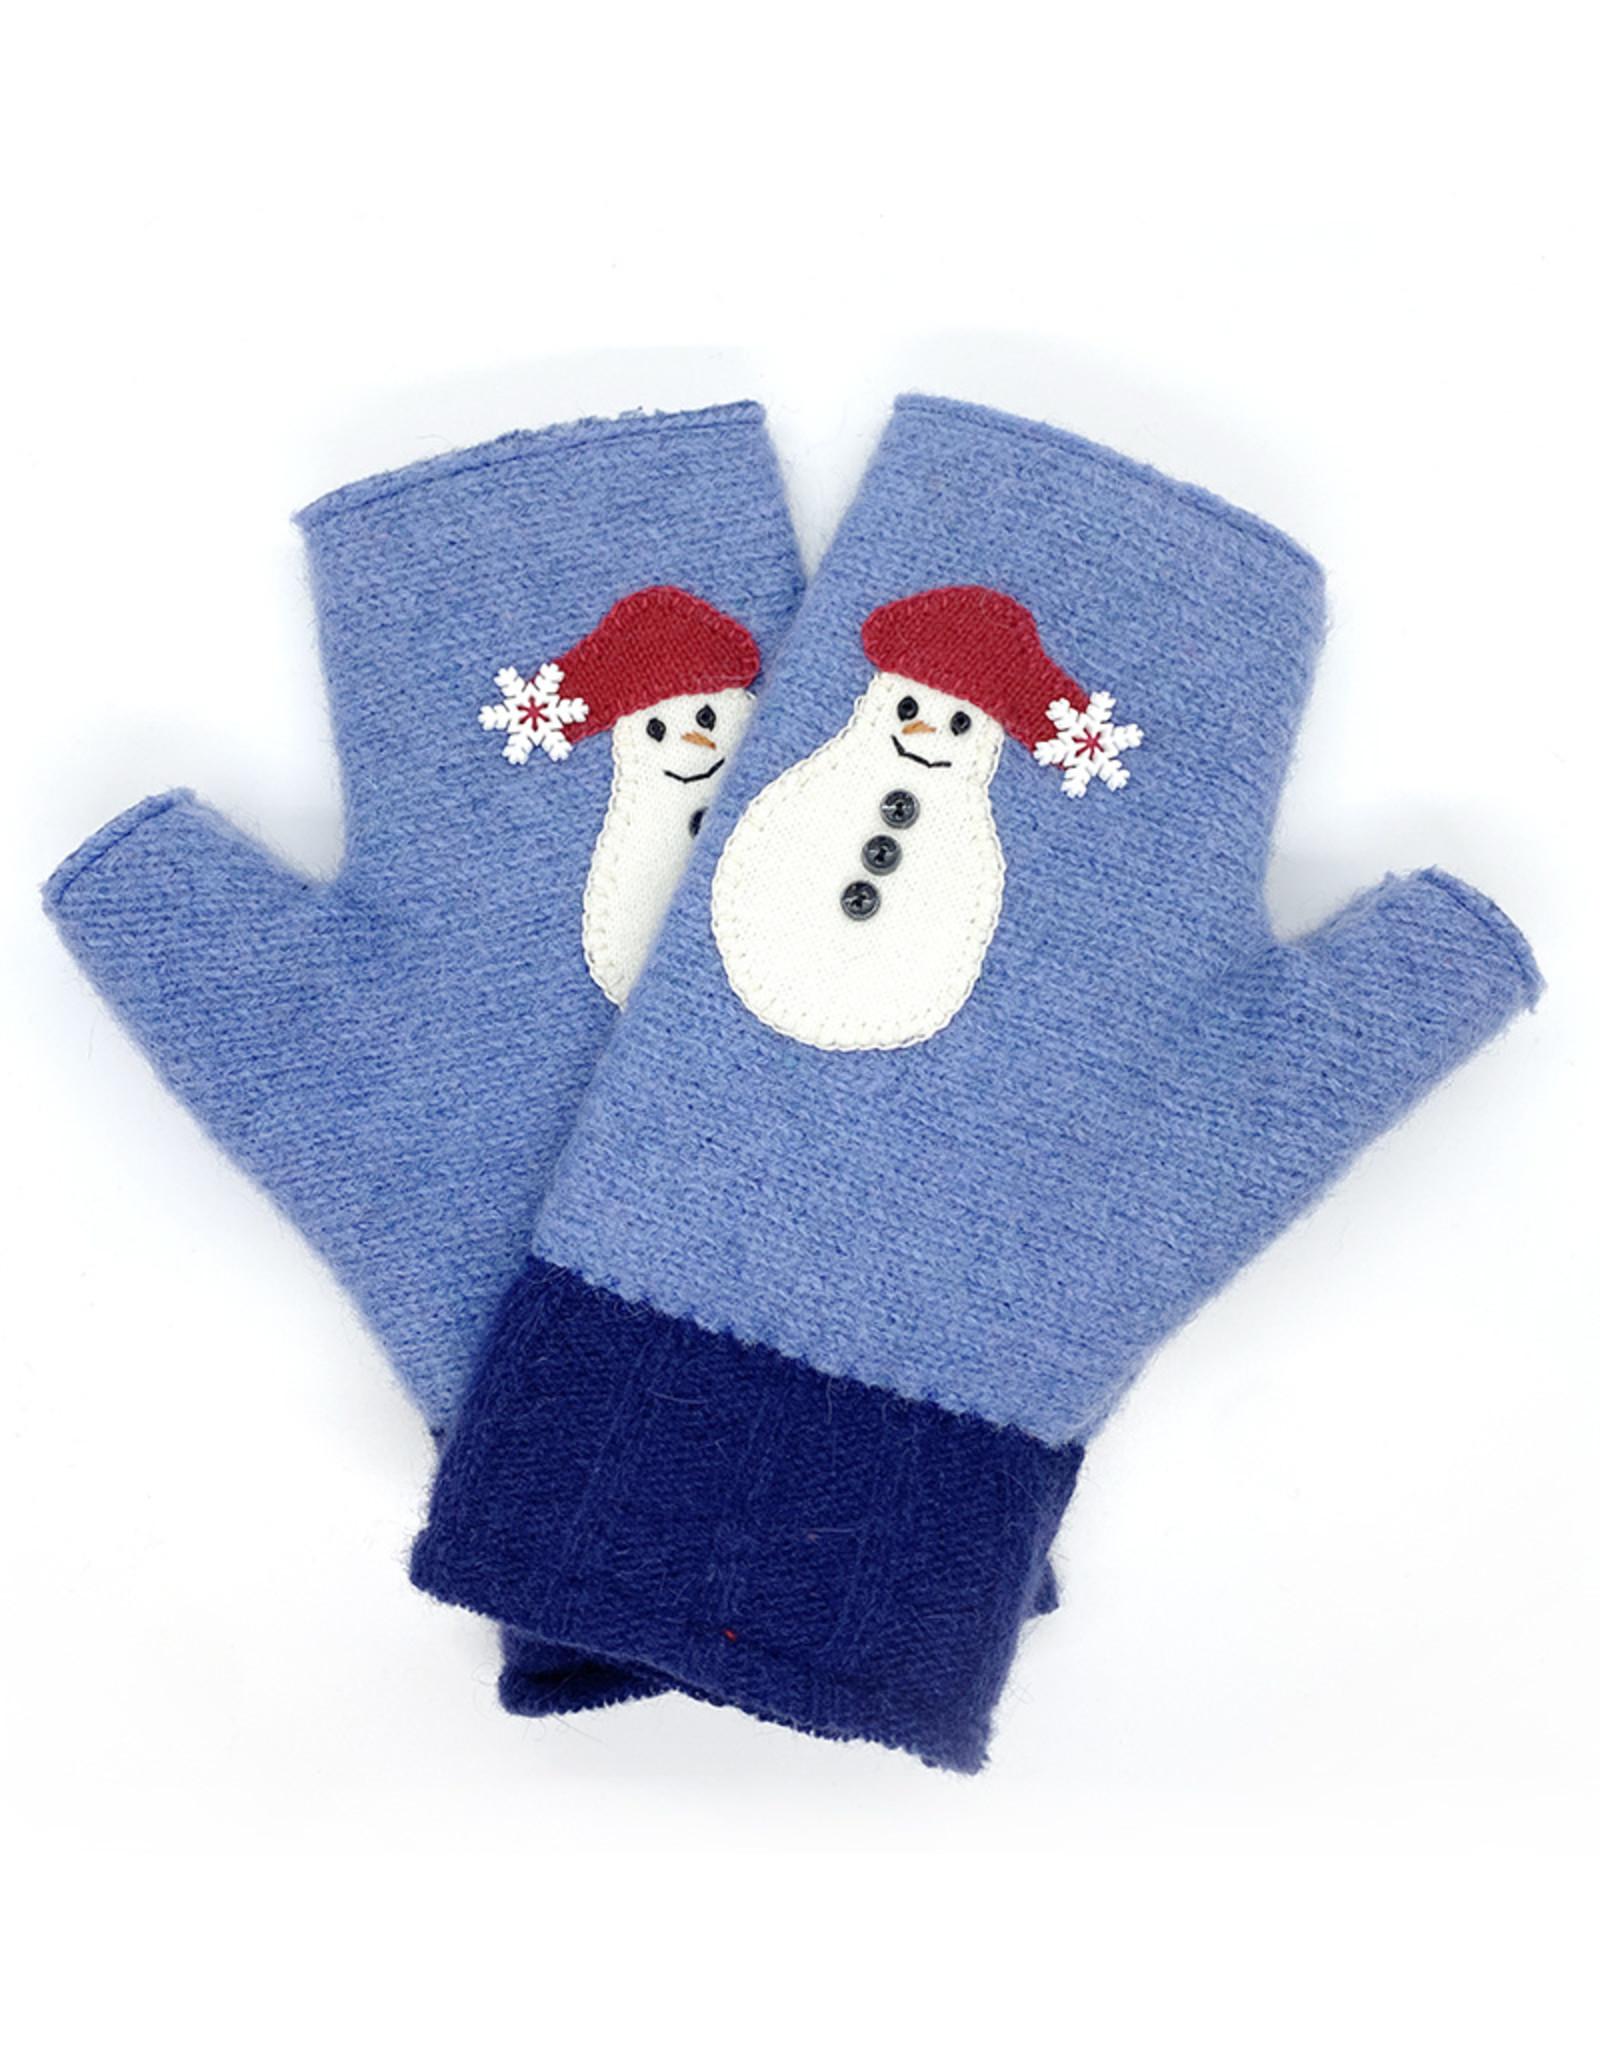 Linda Strick Snowman Fingerless Mittens by Linda Strick